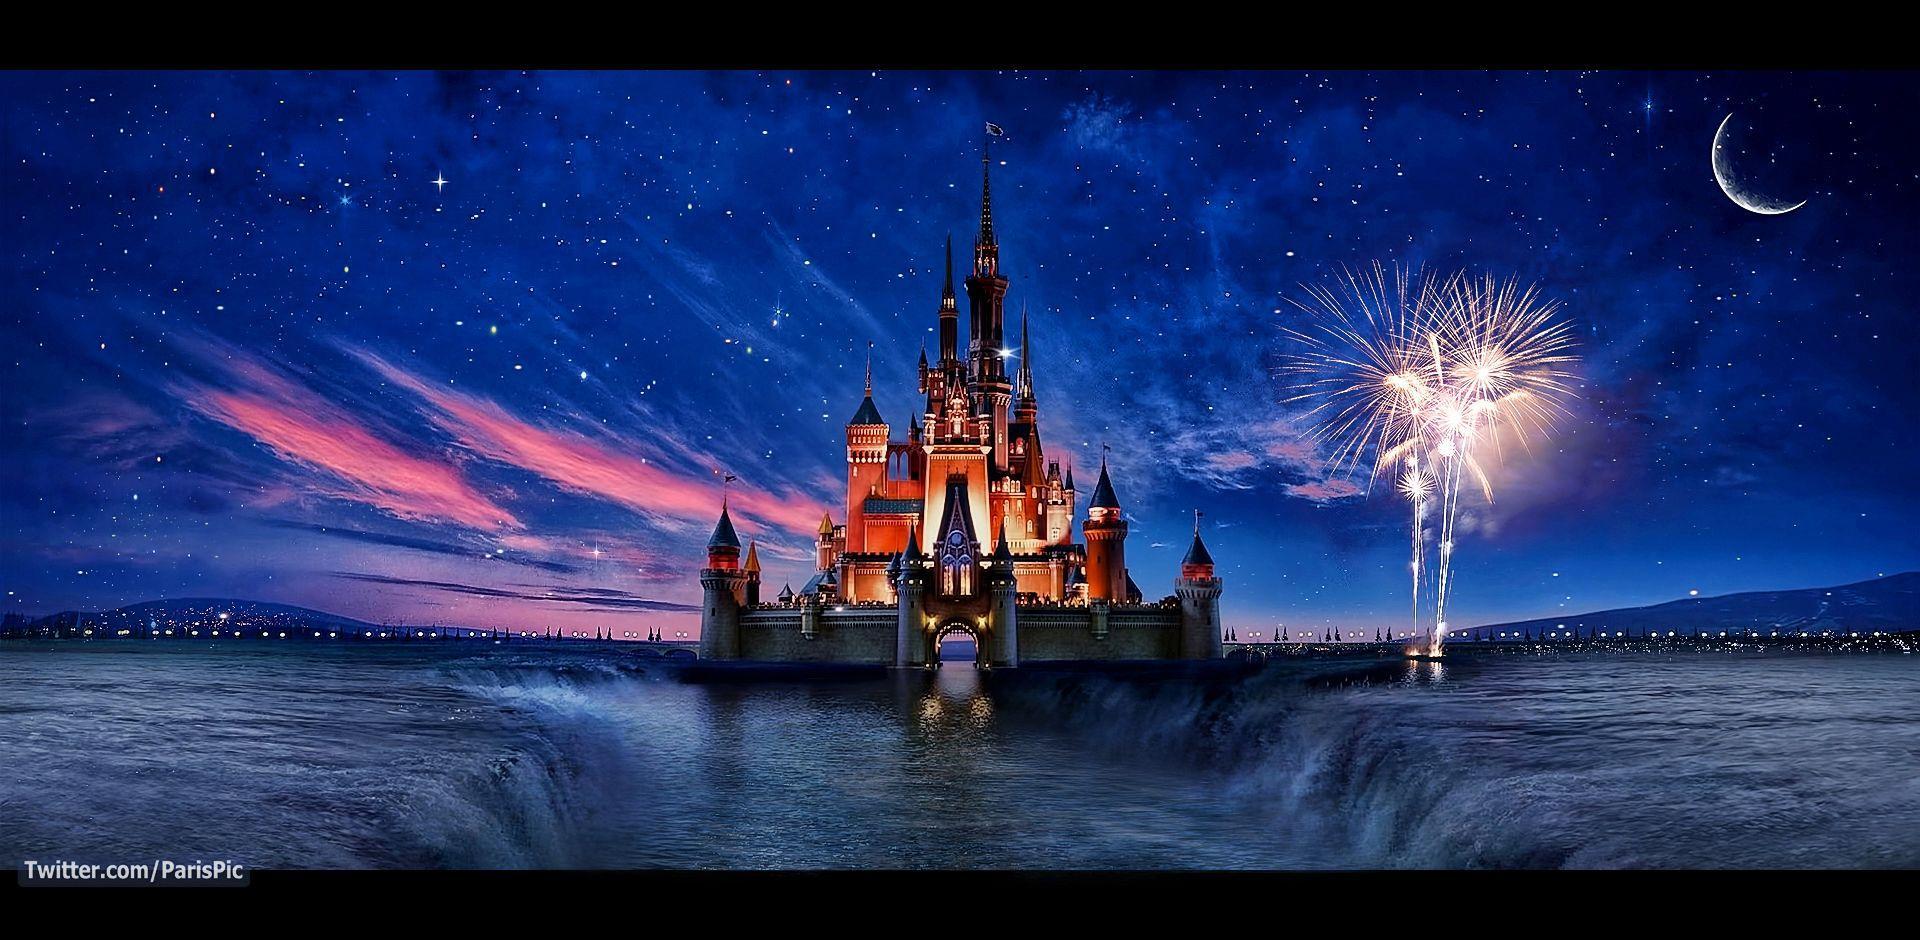 Disney Castle Desktop Wallpapers Top Free Disney Castle Desktop Backgrounds Wallpaperaccess